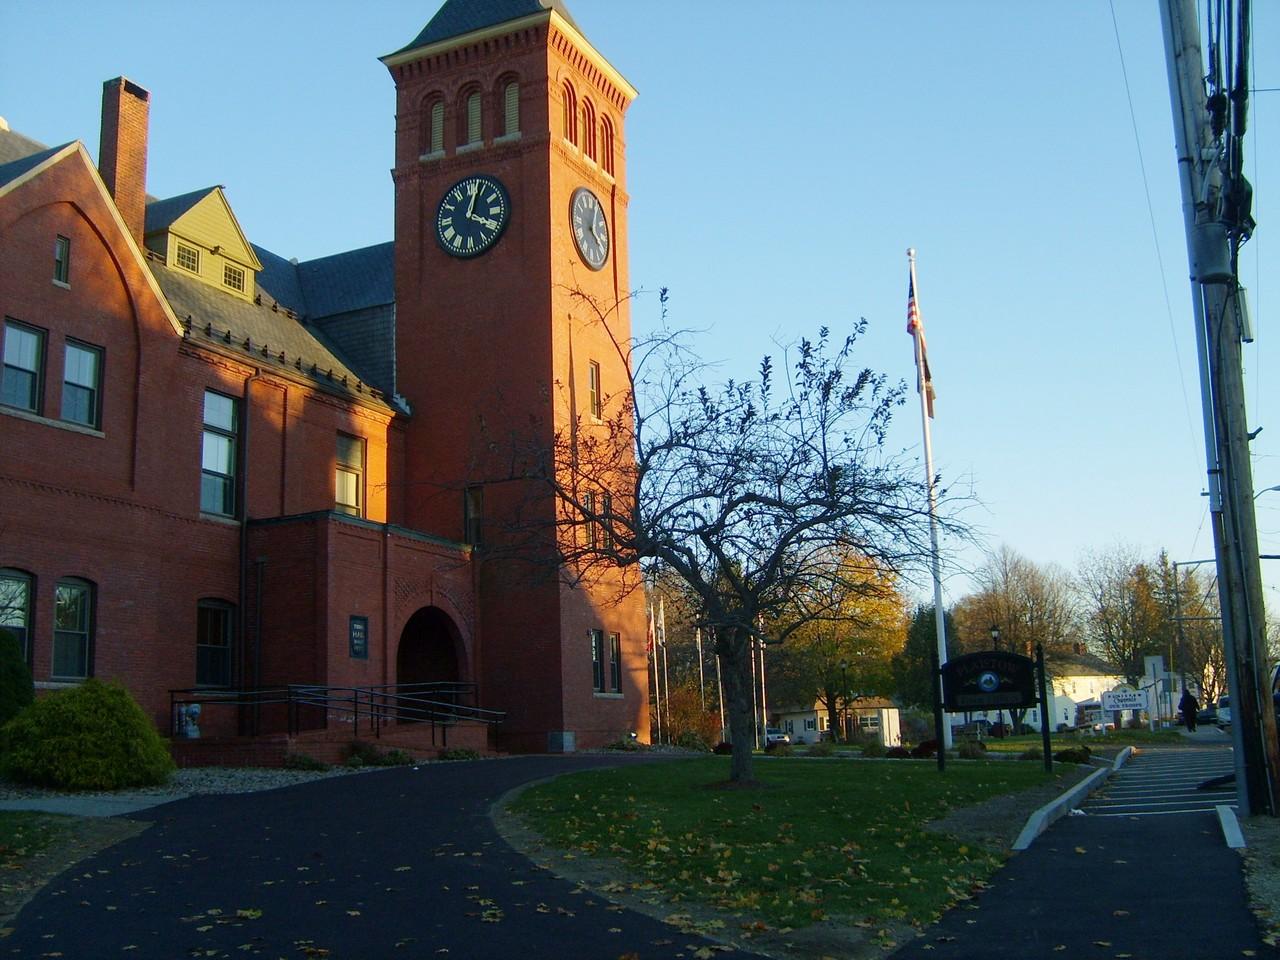 Plaistow Town Hall